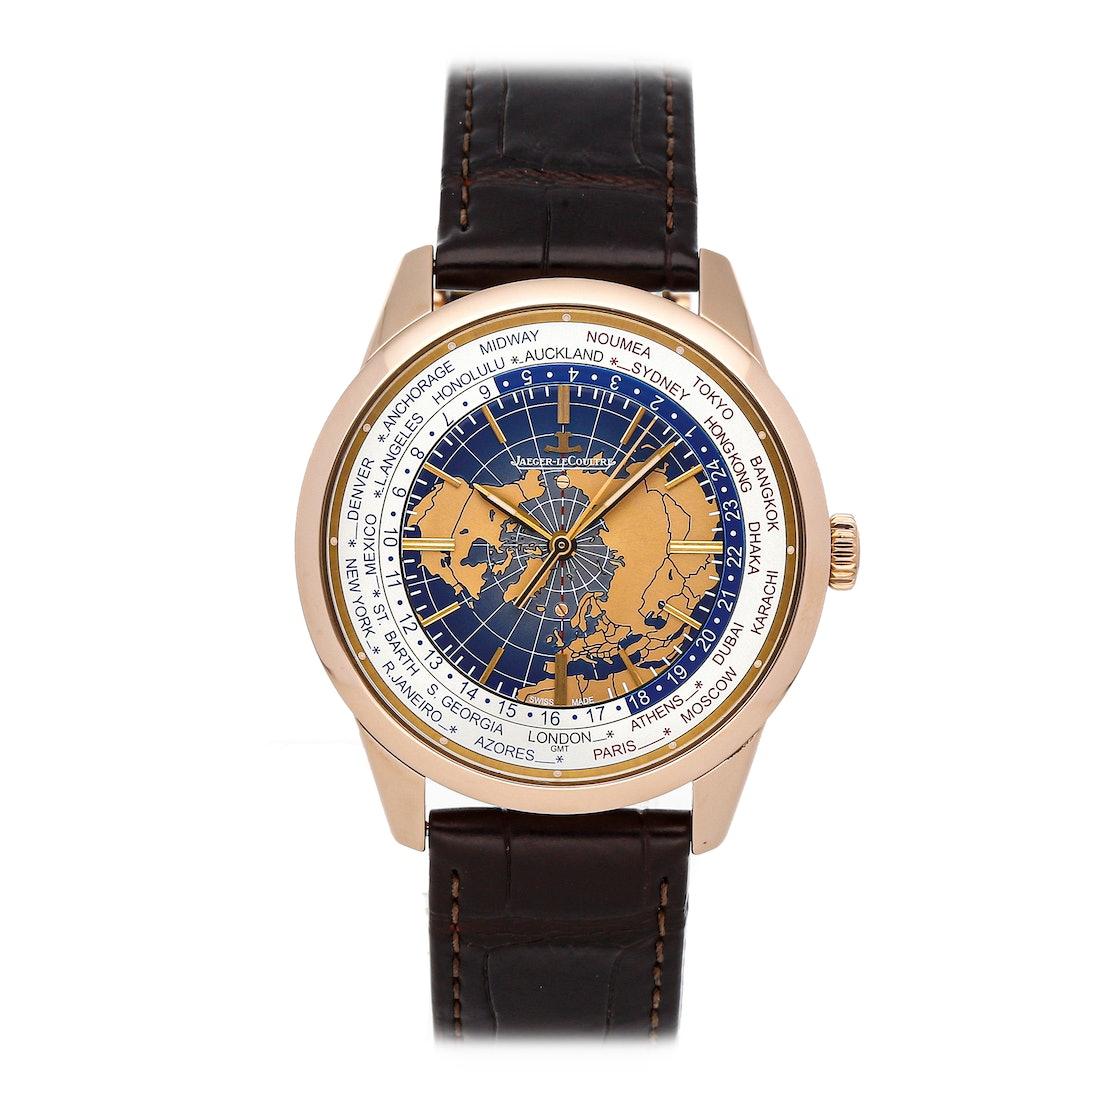 Jaeger-LeCoultre Geophysic Universal Time Q8102520